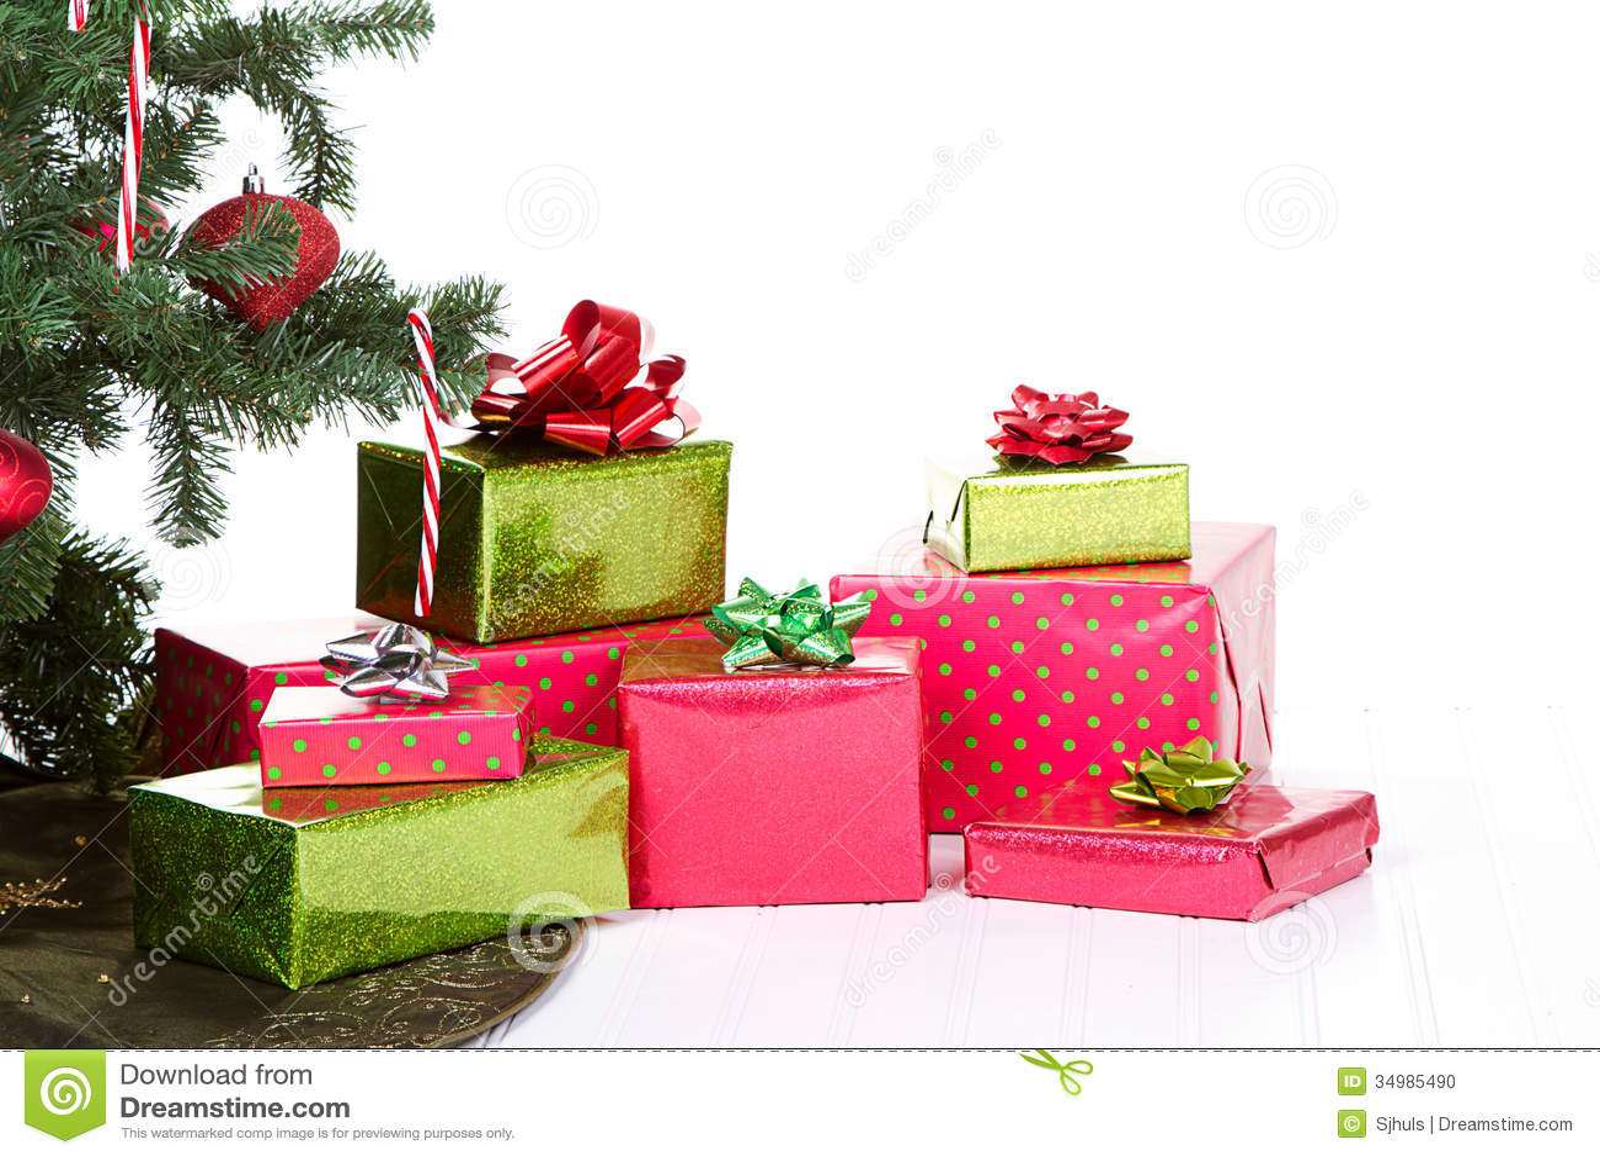 Christmas Presents Under A Christmas Tree Stock Photo - Image ...